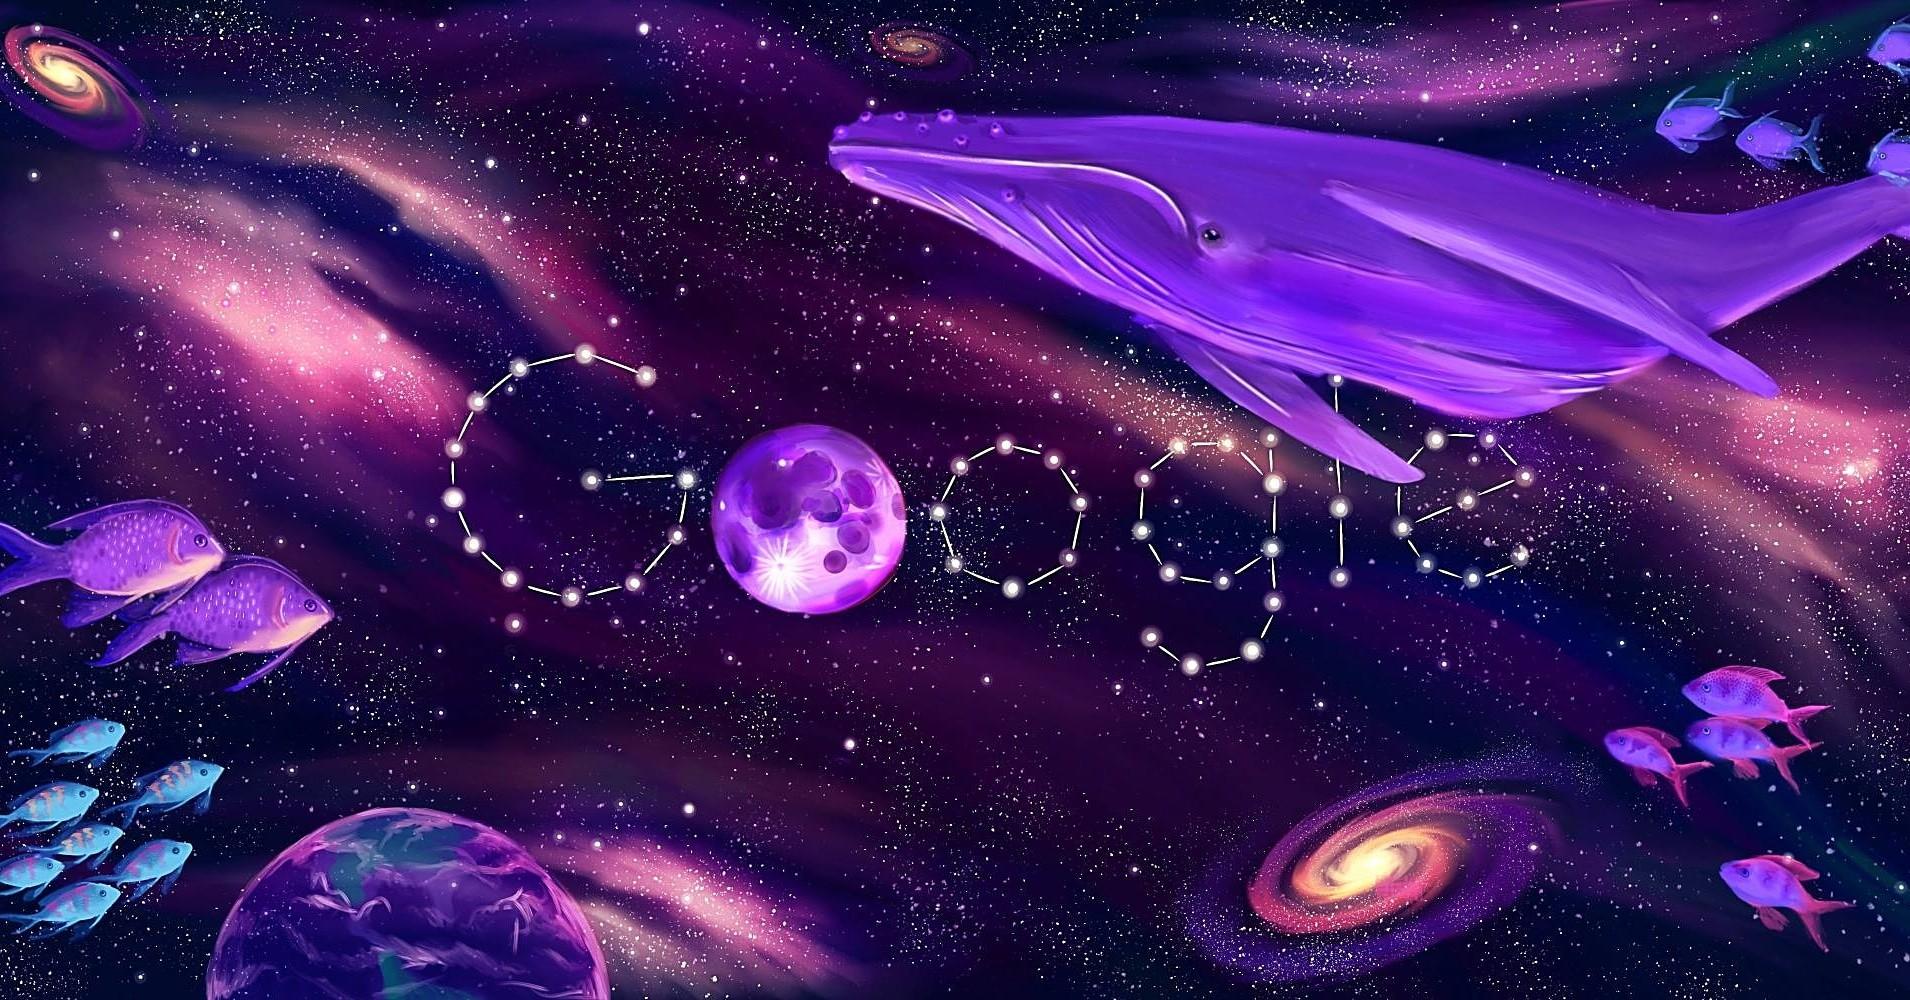 Kira Morrison Doodle For Google 2018 Submission